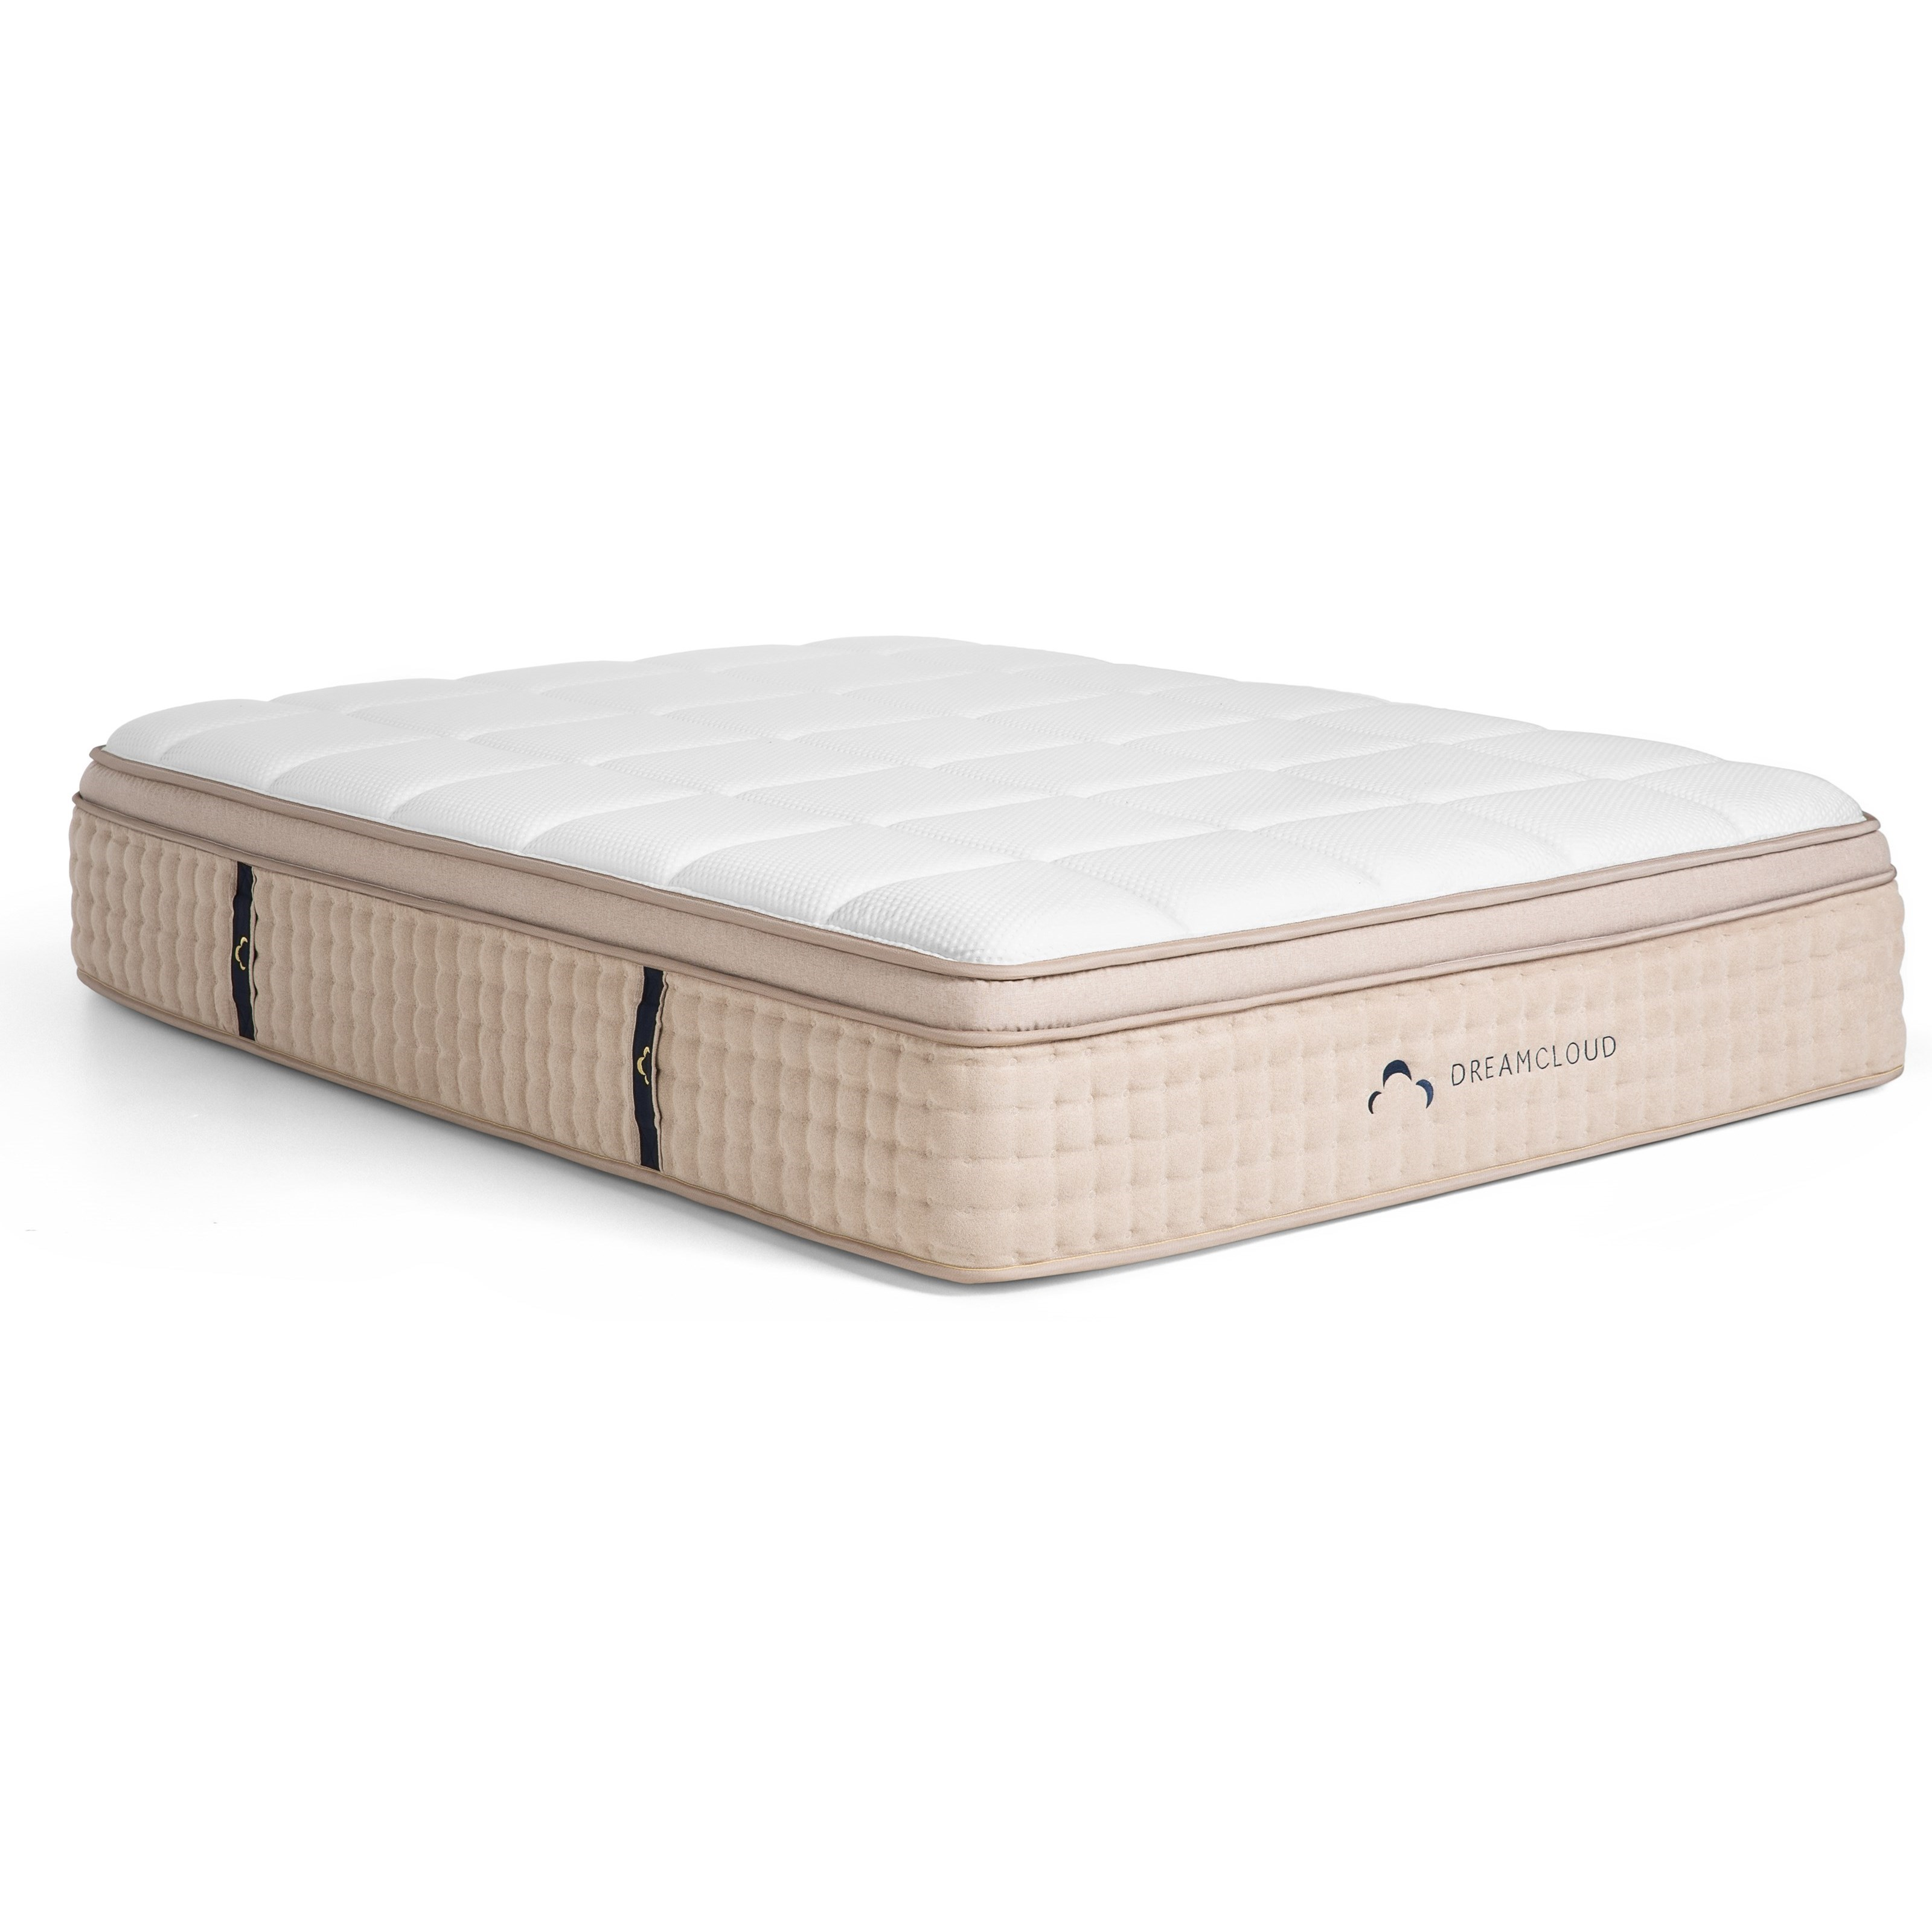 "Dream Cloud Mattress Original King 15"" Euro Top Hybrid Mattress by DreamCloud at Virginia Furniture Market"